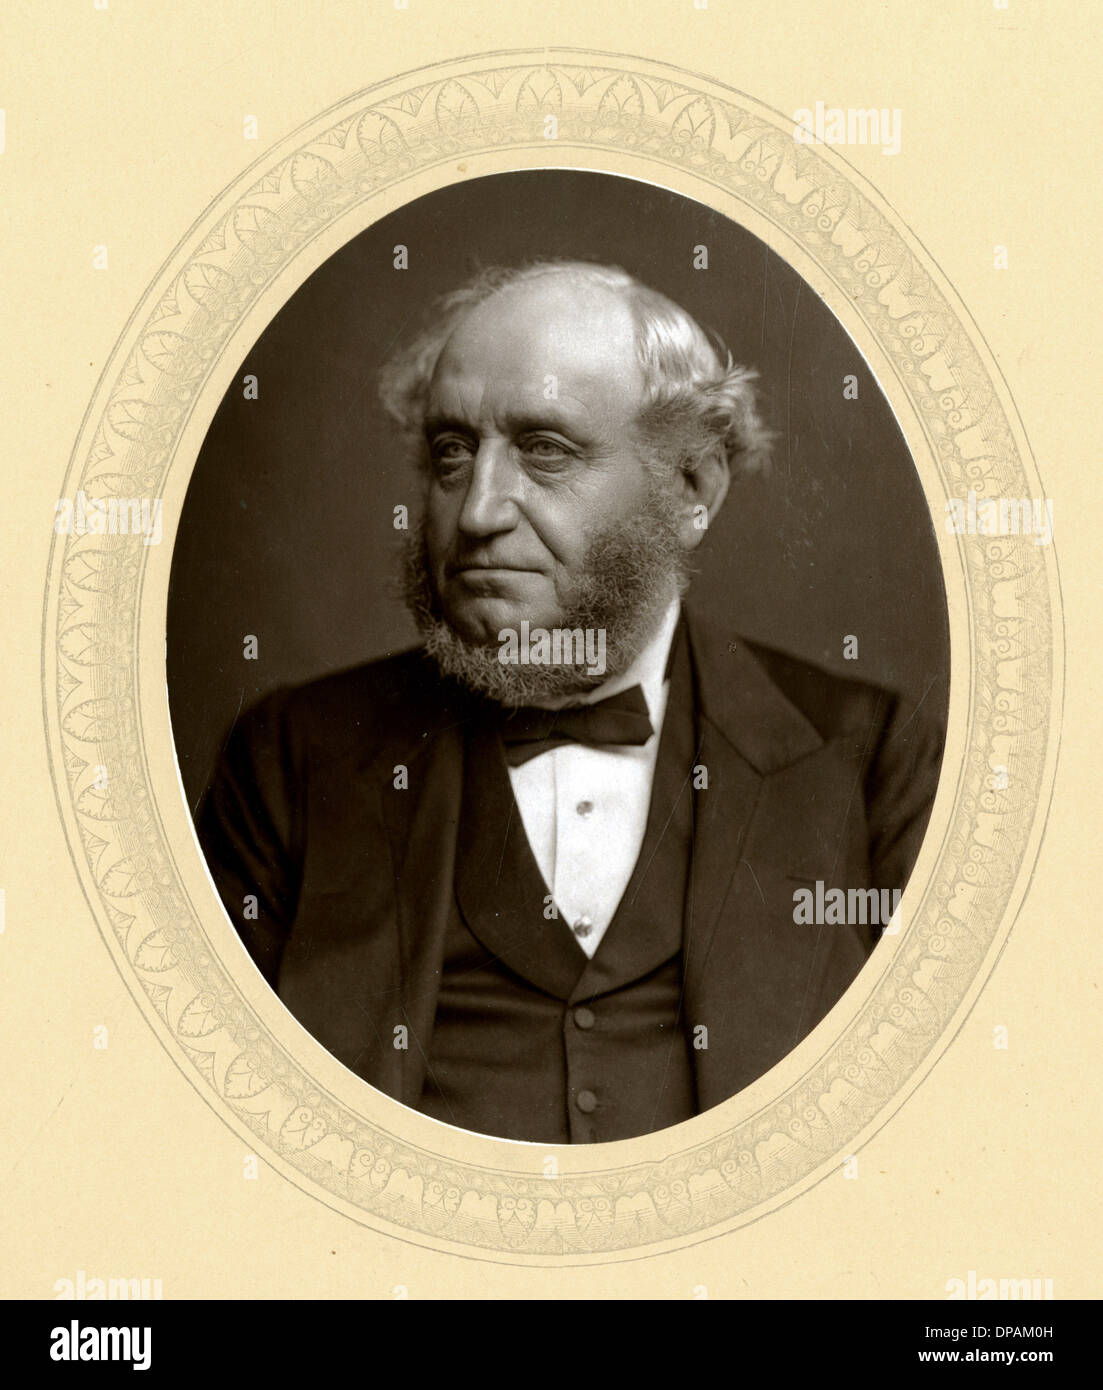 SIR GEORGE ELVEY - Stock Image